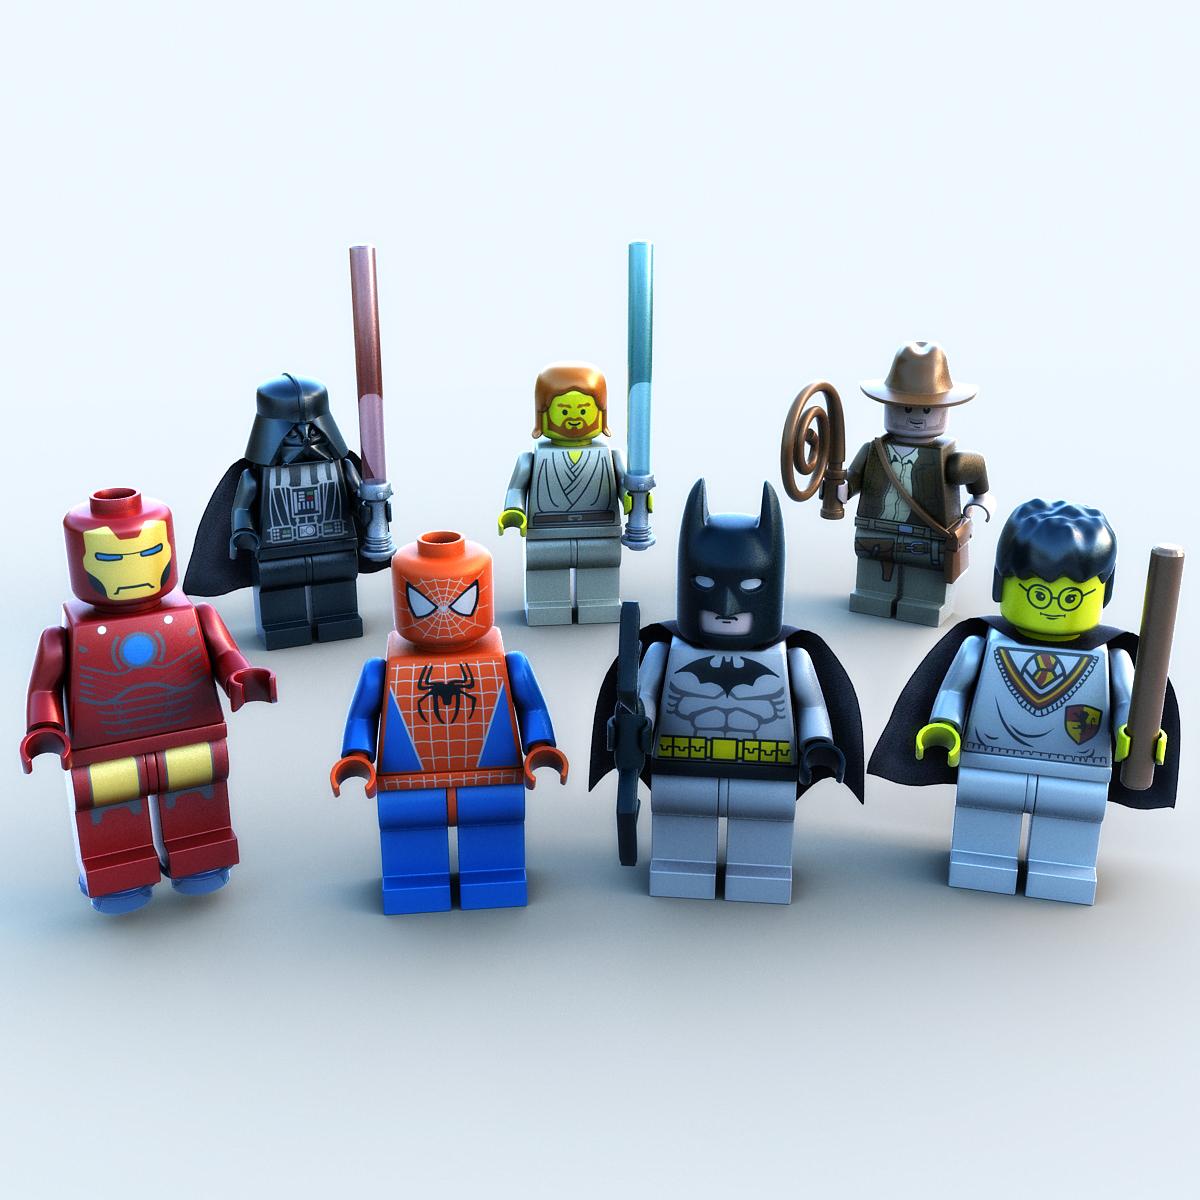 Lego Movie Toys : Lego movie figures collection d model max obj ds fbx